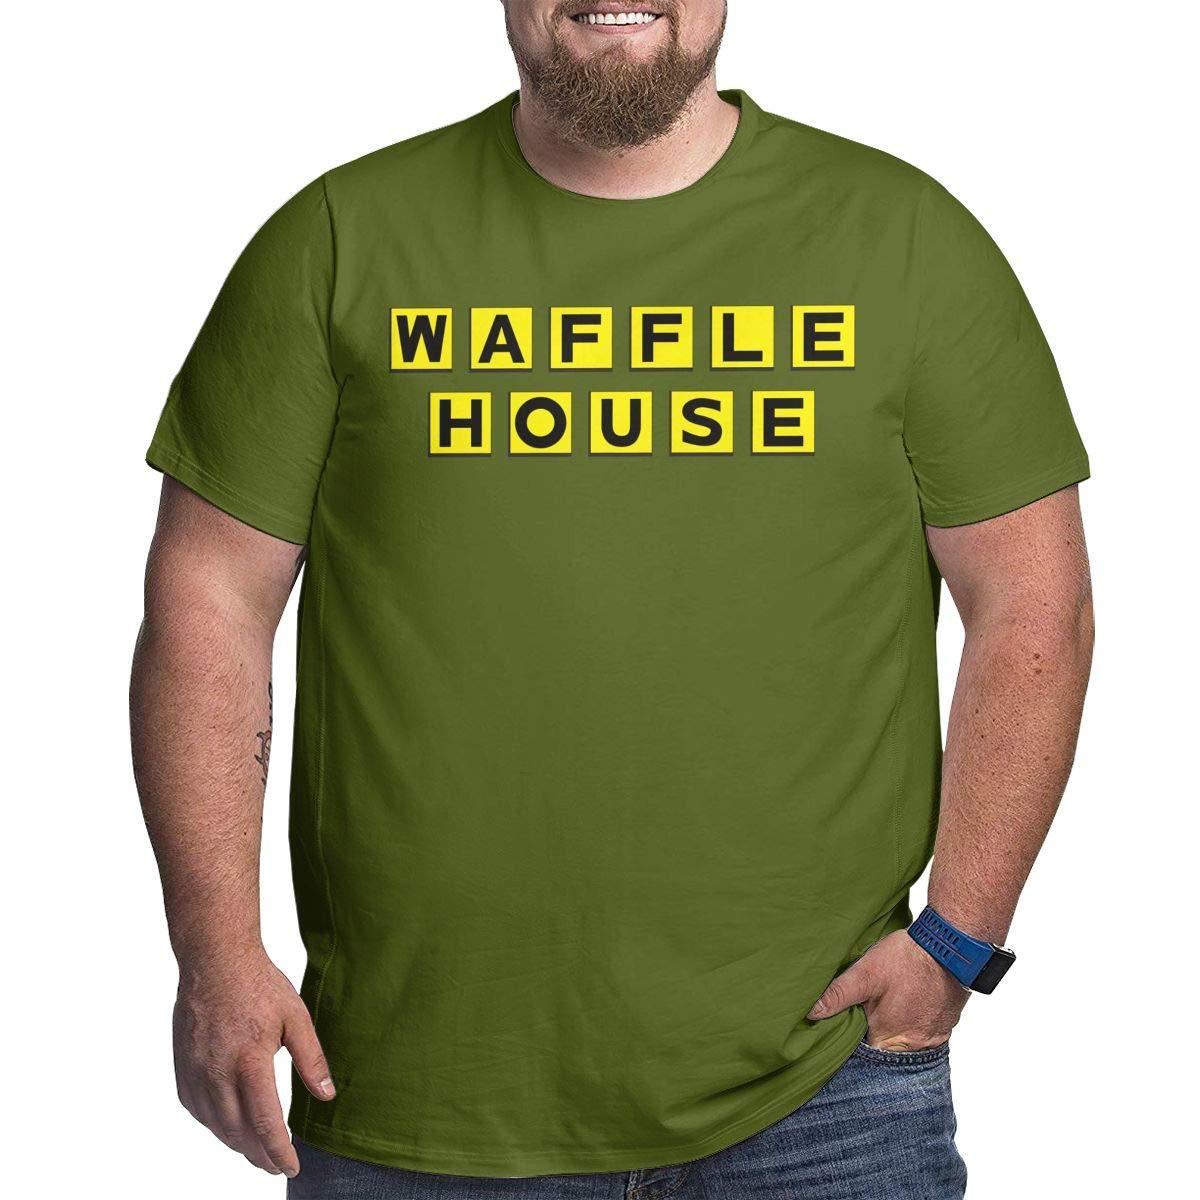 Fat Men's T Shirt Waffle House Logo Tee Shirts T-Shirt Short-Sleeve Round Neck Tshirt for Men Youth Boys Moss Green 4XL by BKashy